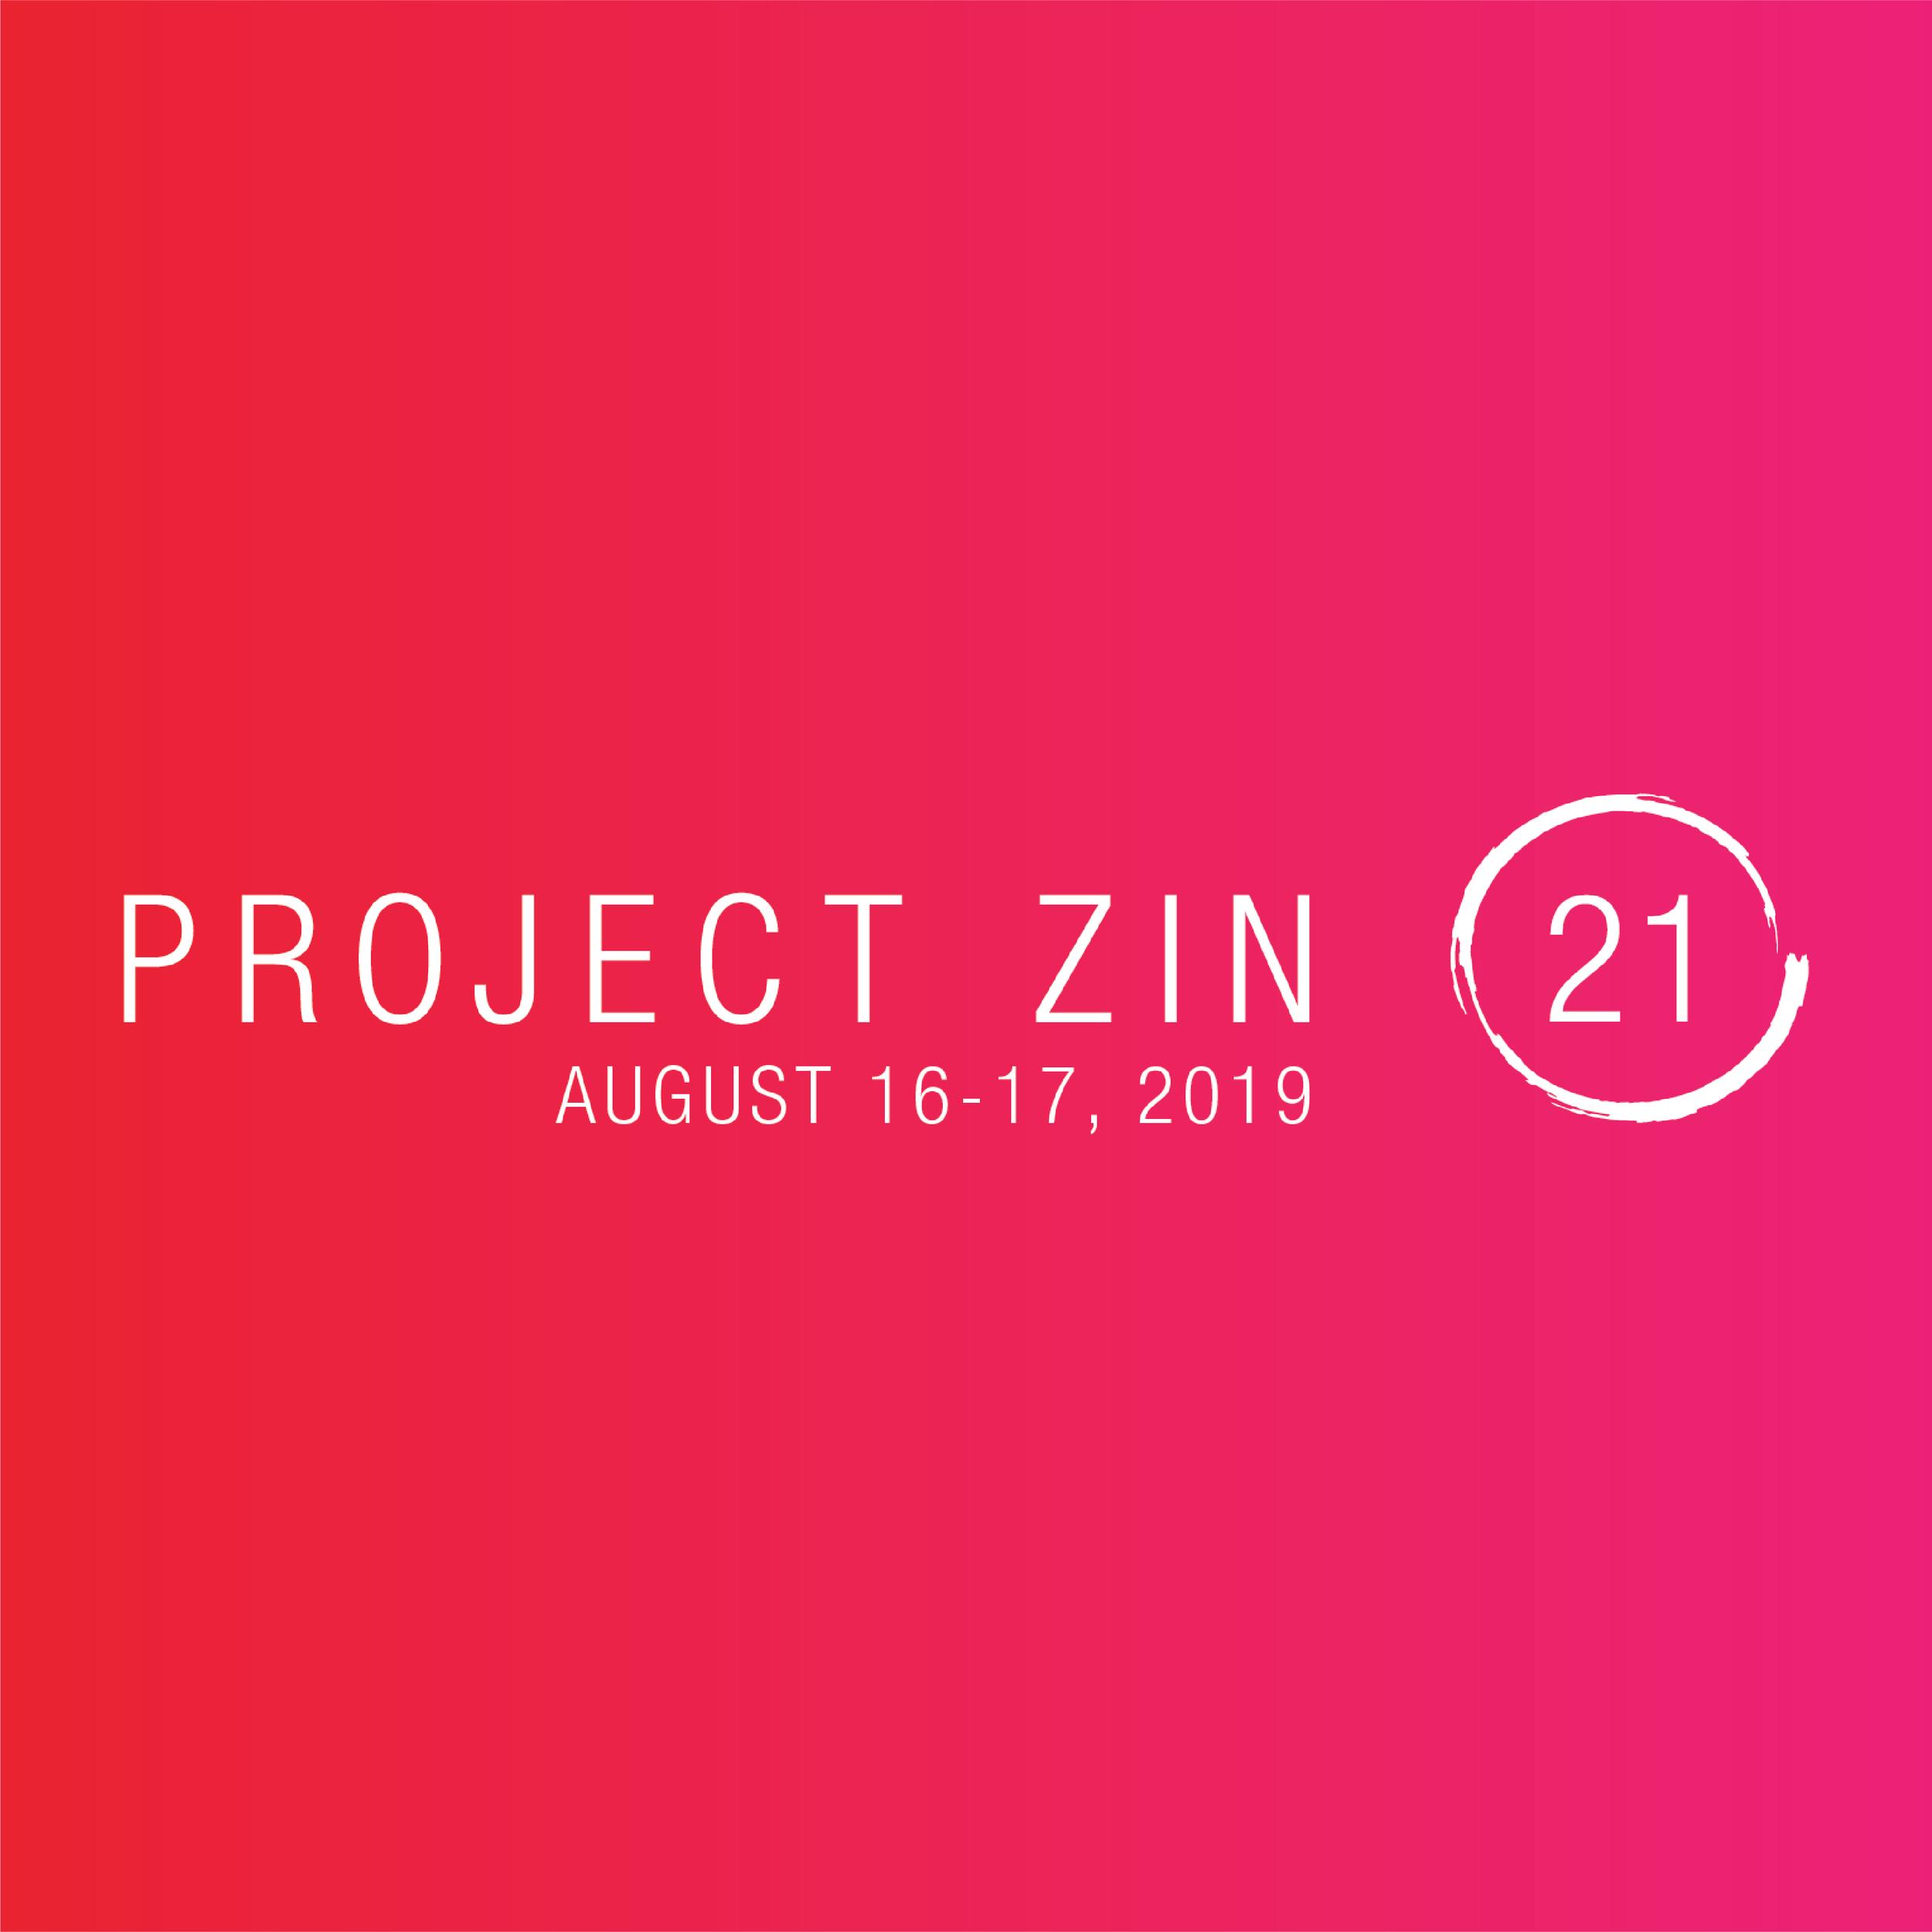 Project Zin Hotel Healdsburg August 17, 2019 6:30 PM - 9:30 PM